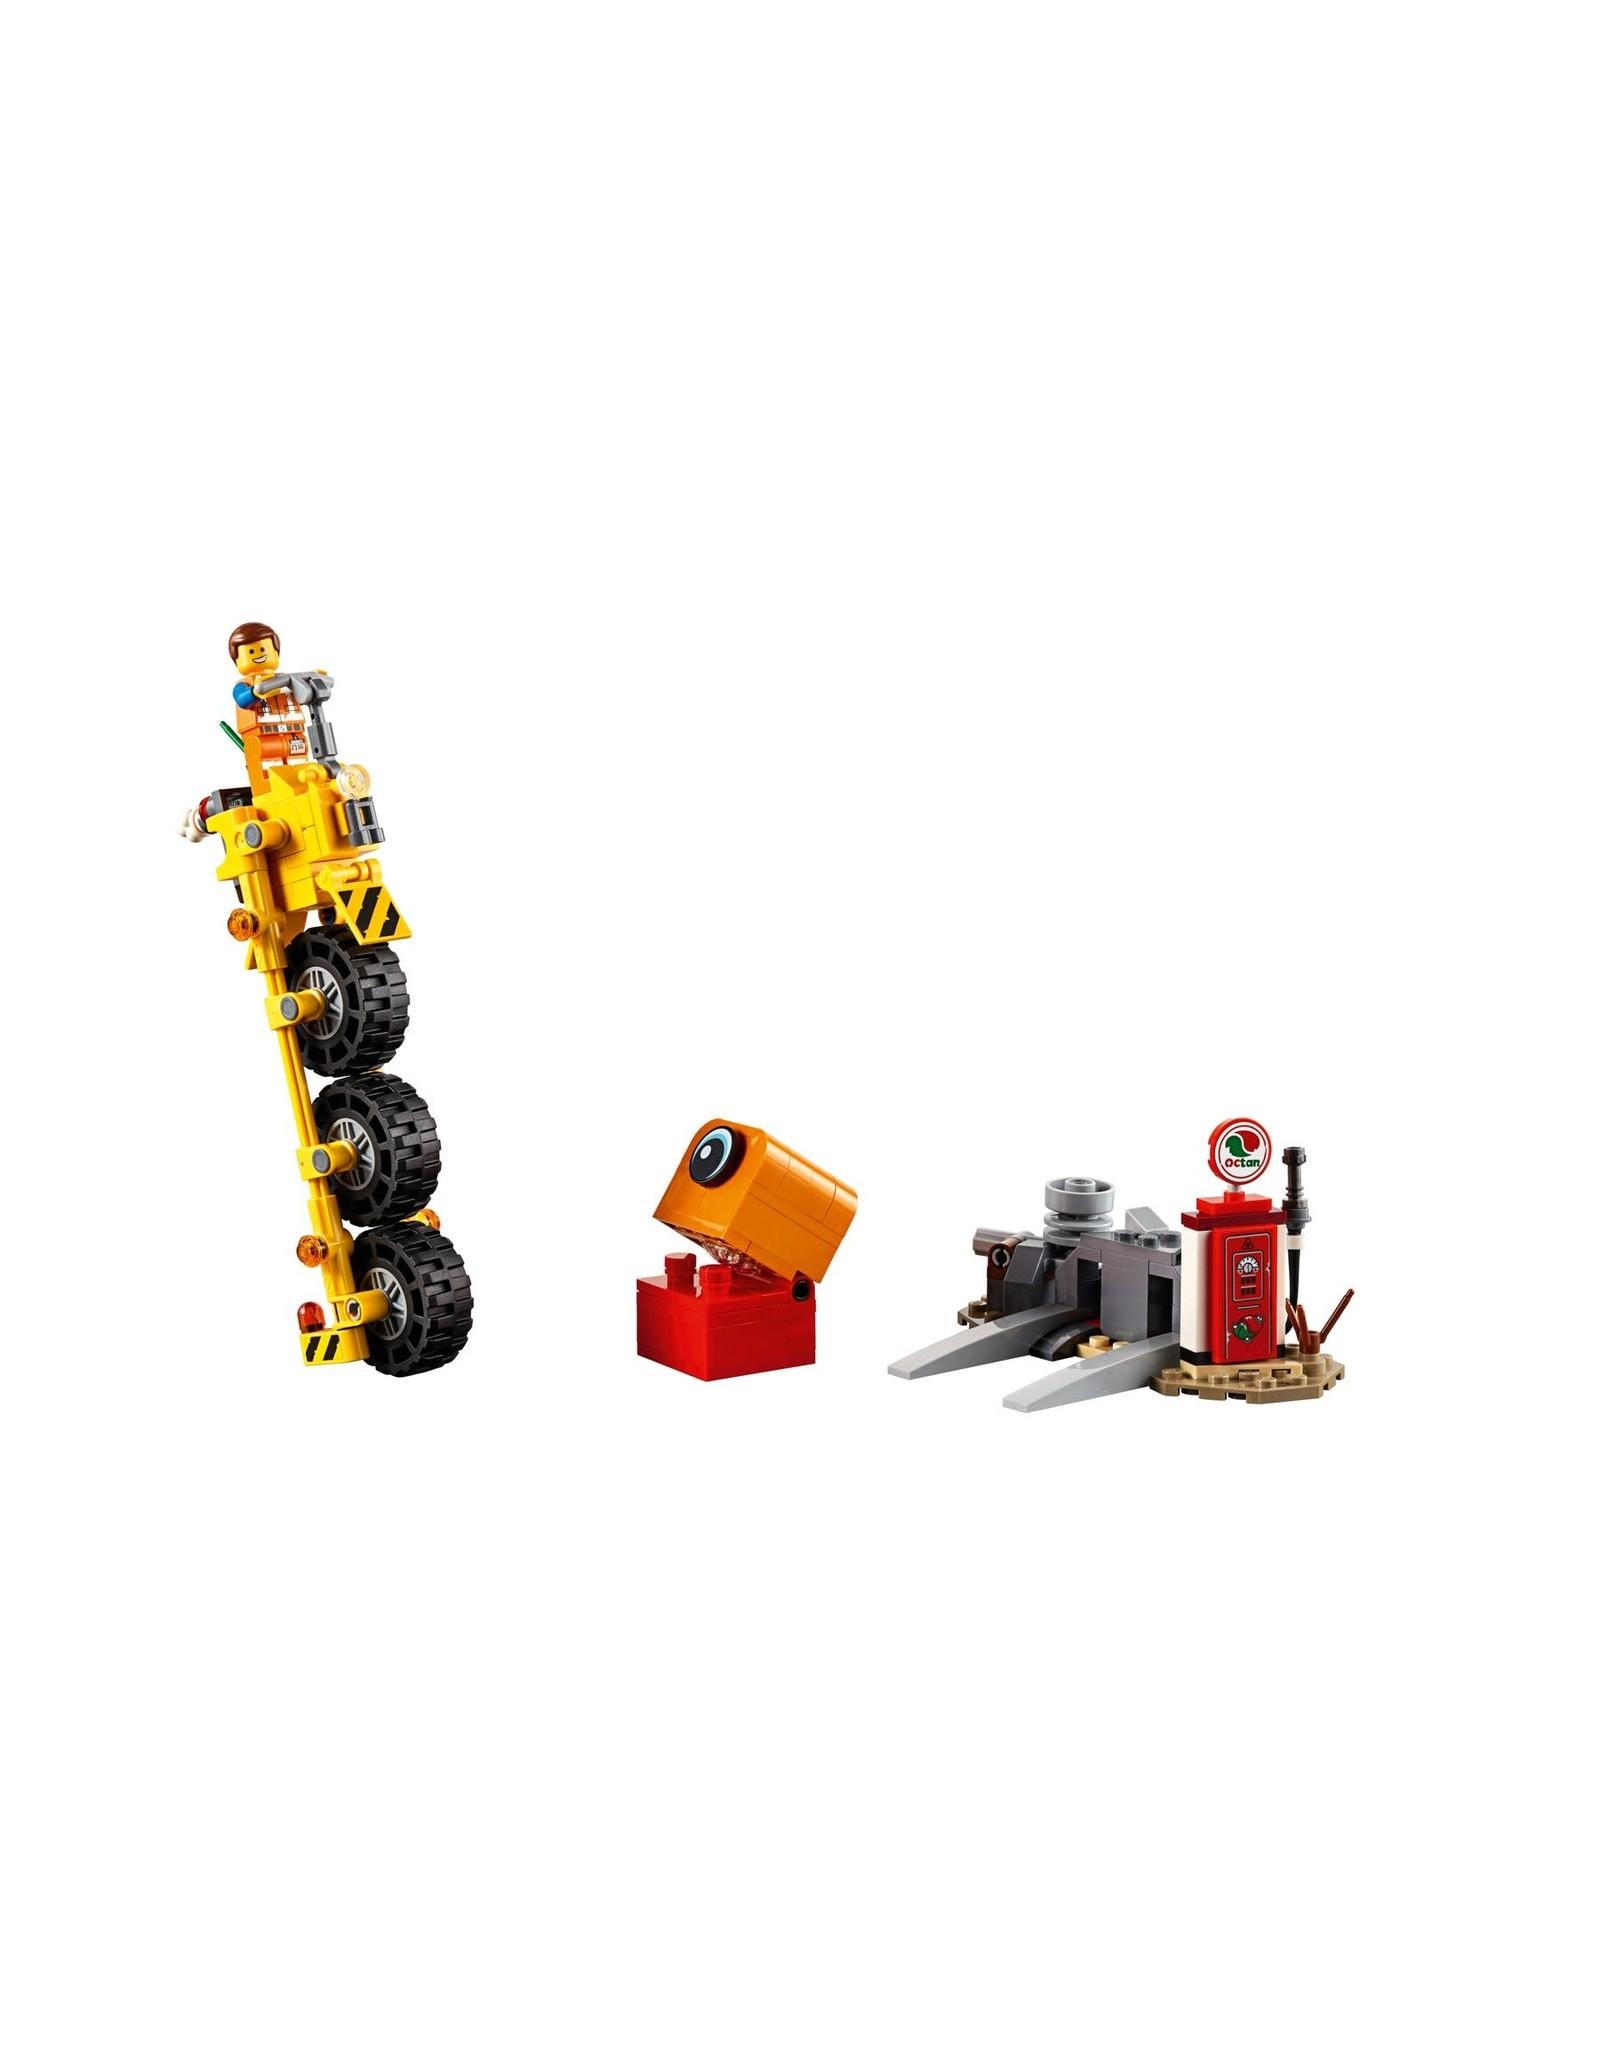 LEGO LEGO Movie 2 Emmet's Thricycle!